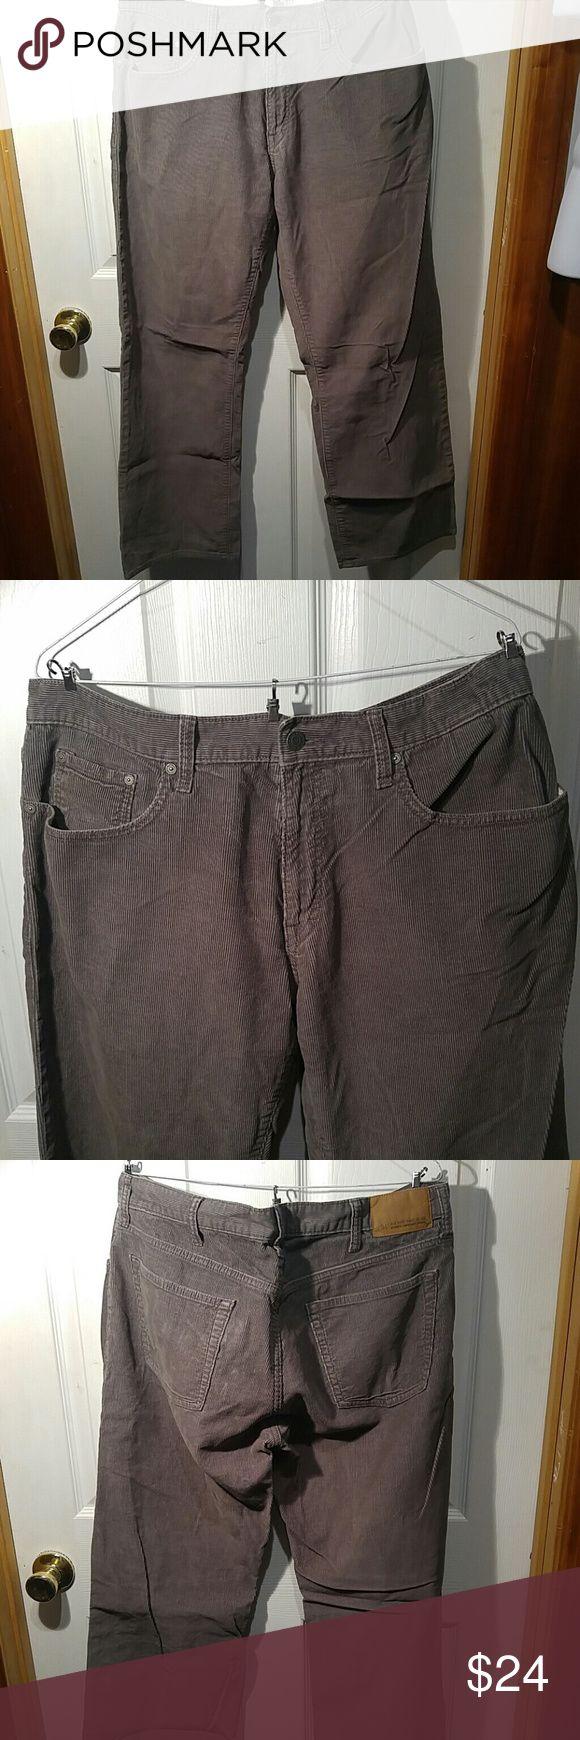 Mens cord pants Loose 36x32 Old Navy Pants Corduroy